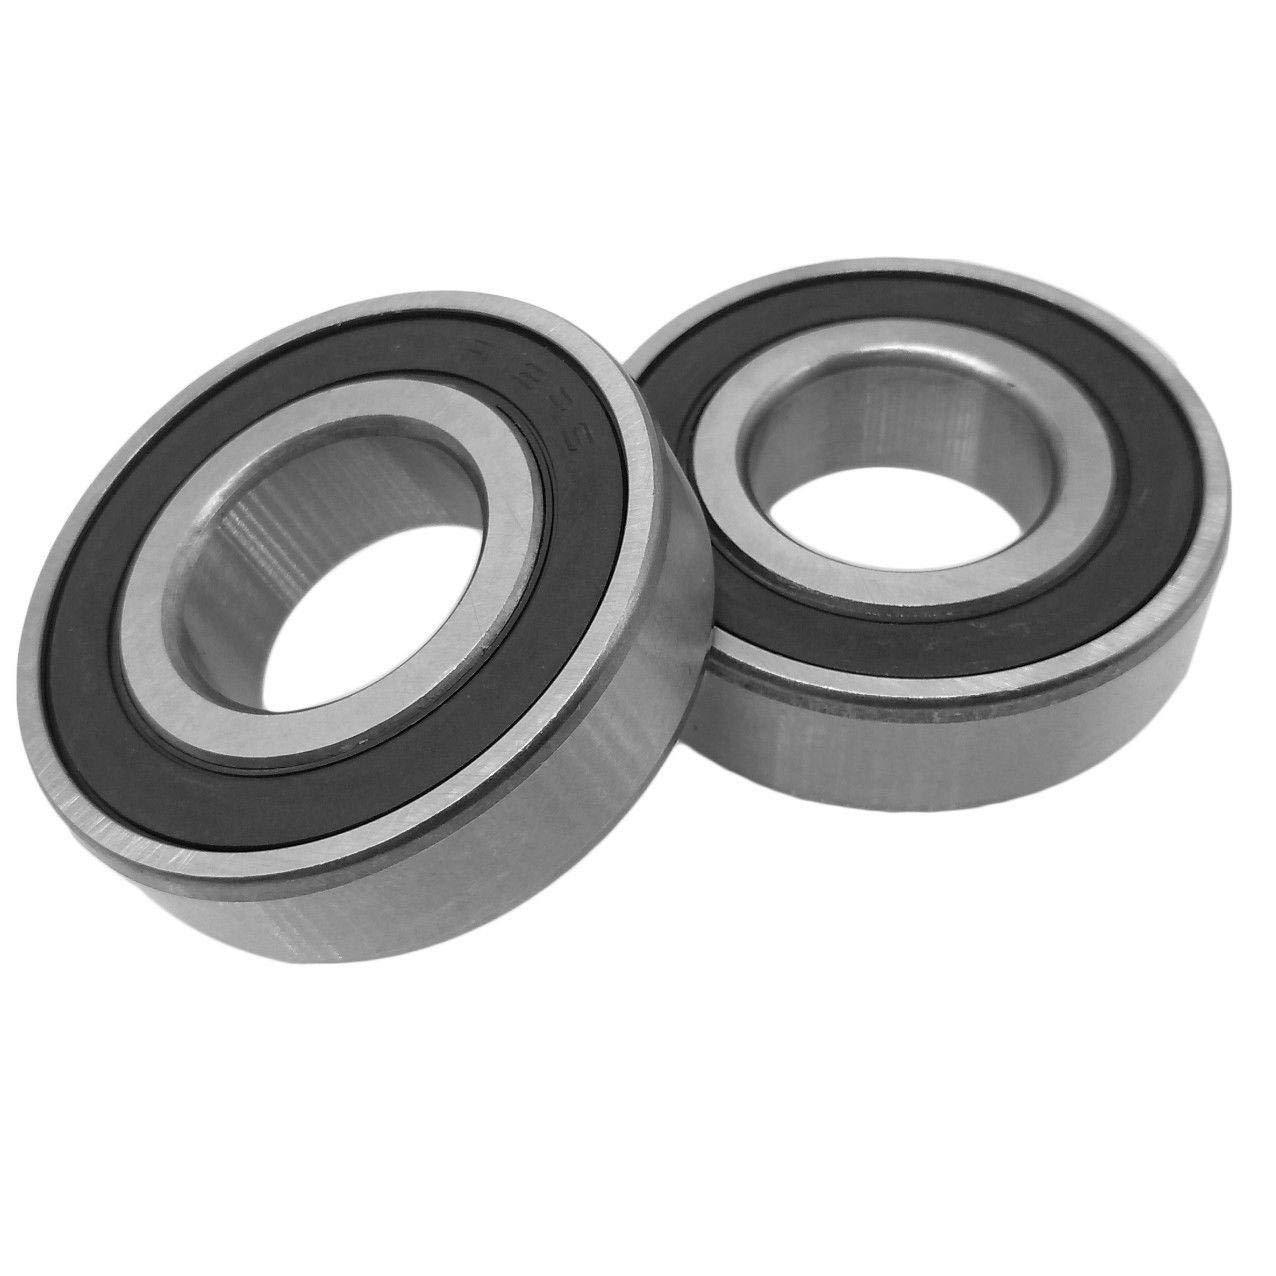 1.875 x 2.750 x 0.312 1.875 x 2.750 x 0.312 Dichtomatik Partner Factory TCM 18273SB-H-BX NBR SB-H Type Buna Rubber //Carbon Steel Oil Seal